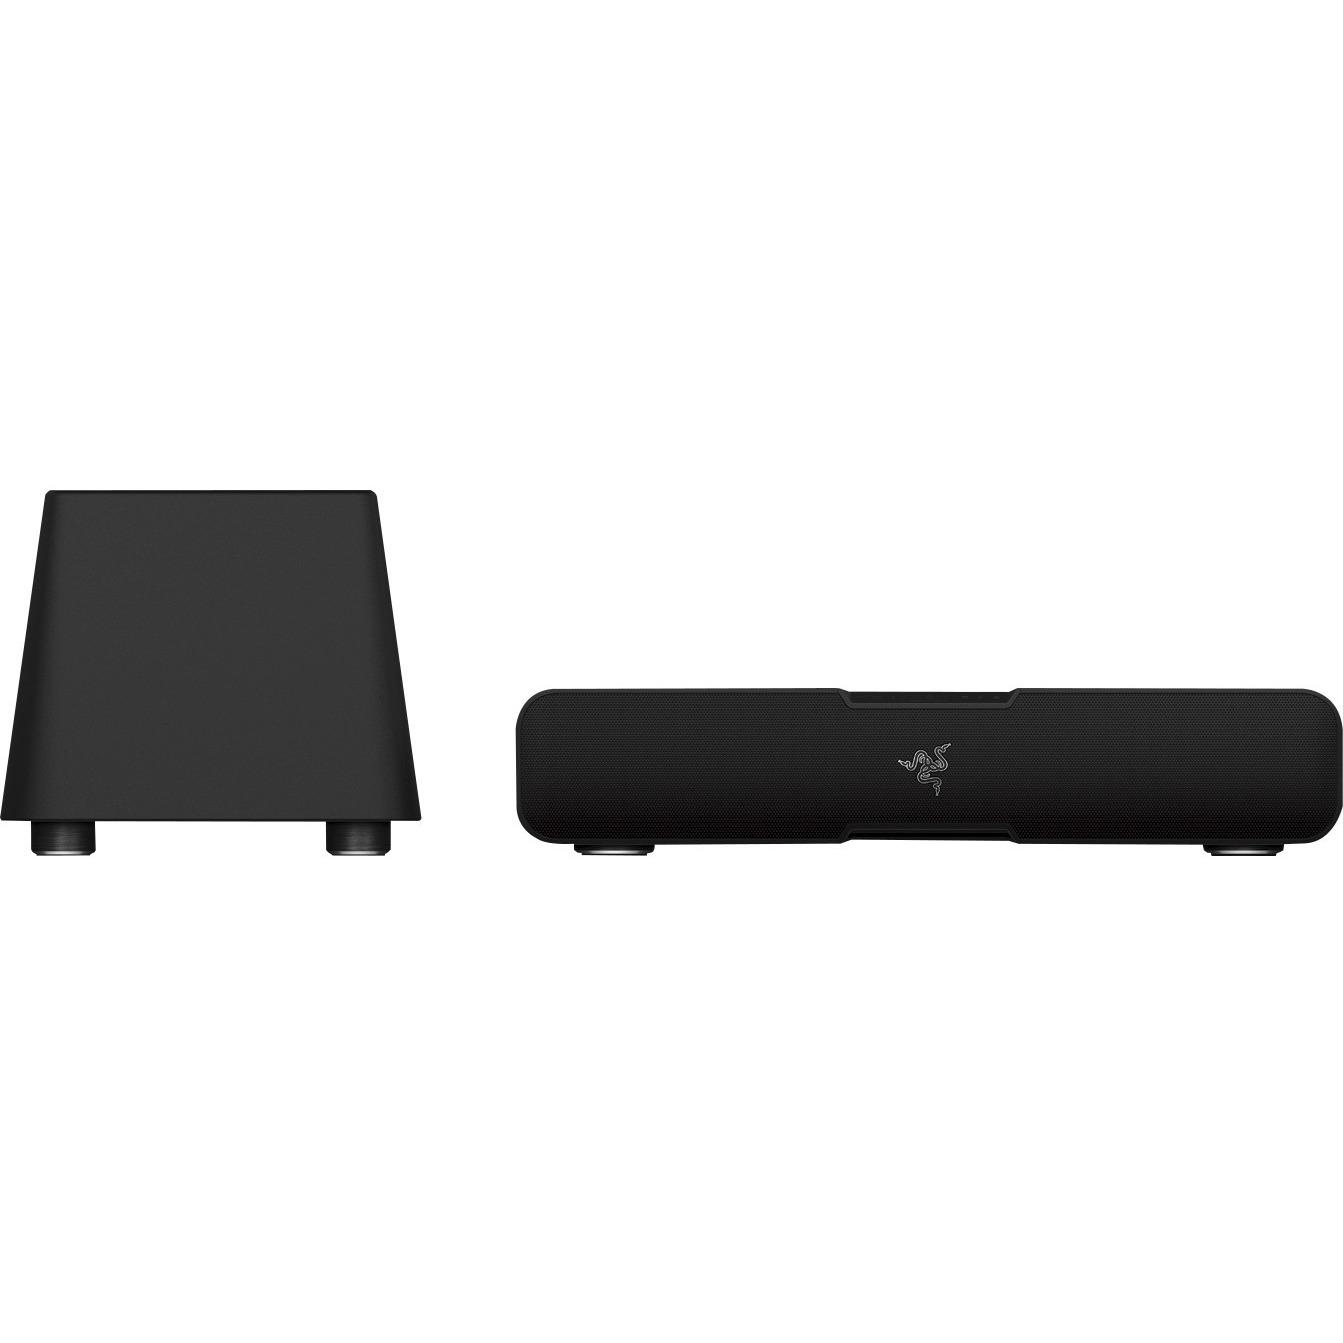 Razer Leviathan 5.1 Speaker System - 60 W RMS - Wireless Speaker(s) - Black - 20 Hz - 20 kHz - 32.8 ft - Dolby Digital, Dolby Virtual Speaker, Dolby Pro Logic II - Bluetooth 1